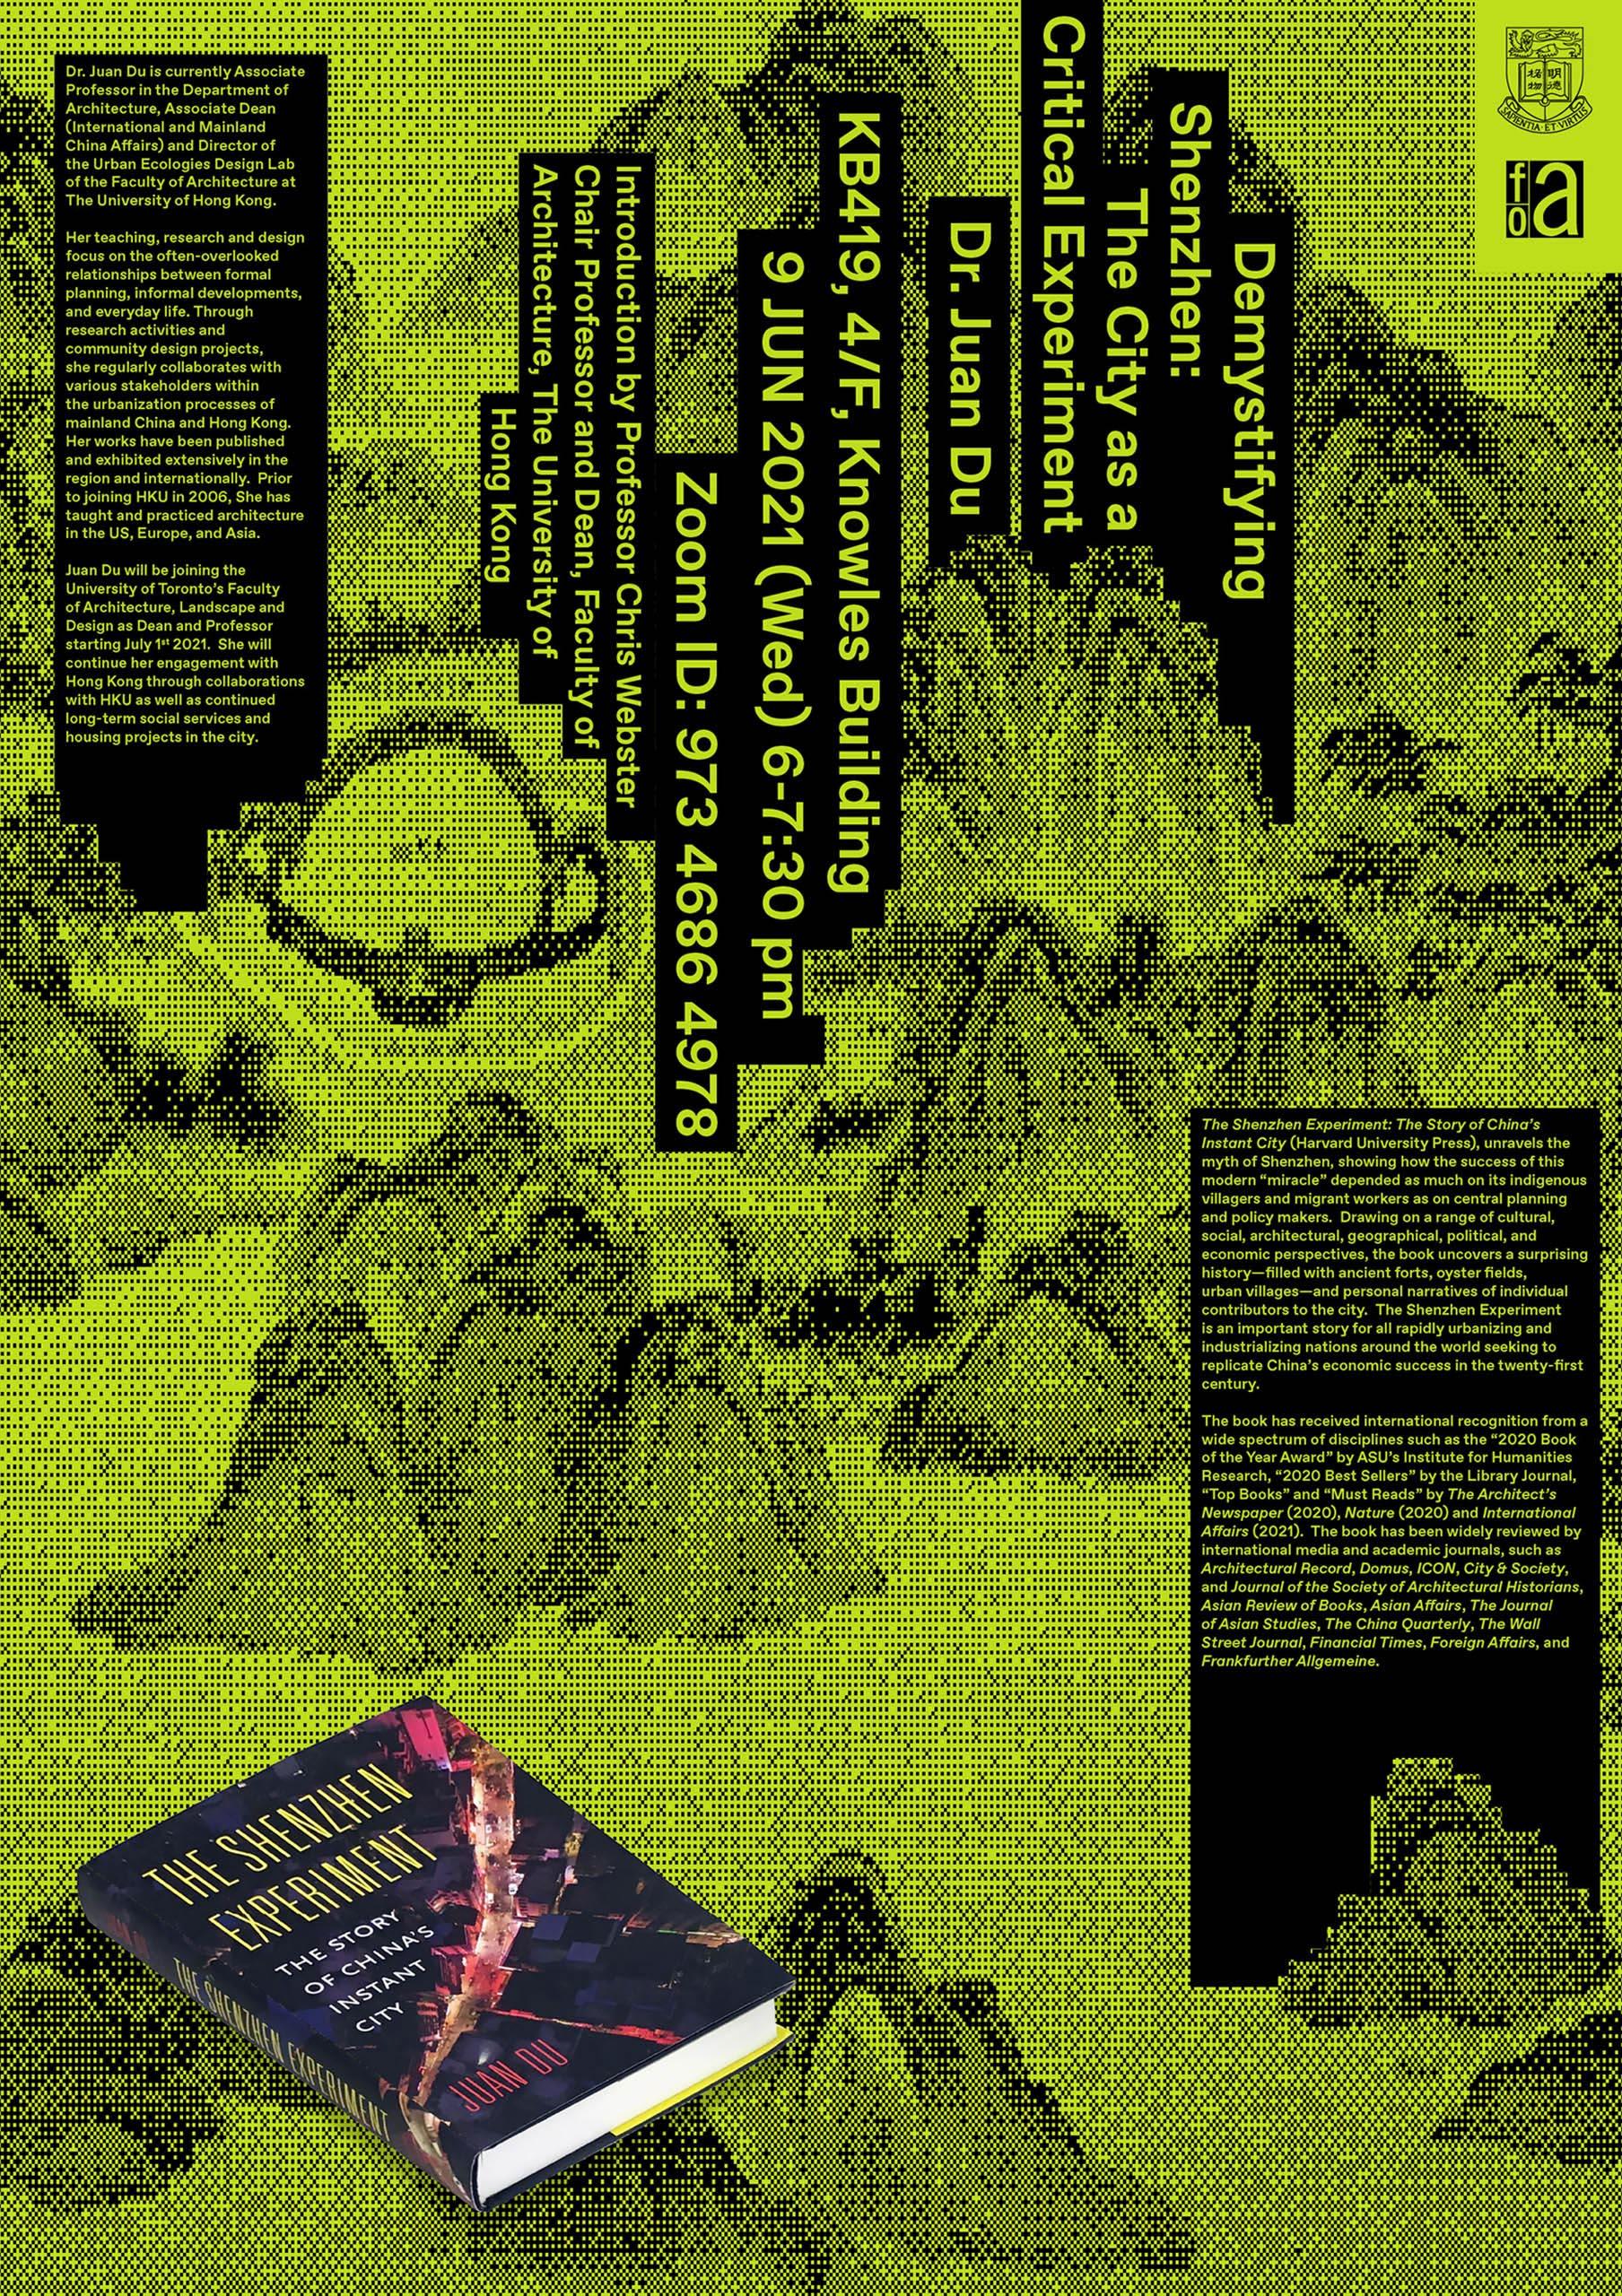 Book Launch & Talk — Demystifying Shenzhen: The City as a Critical Experiment